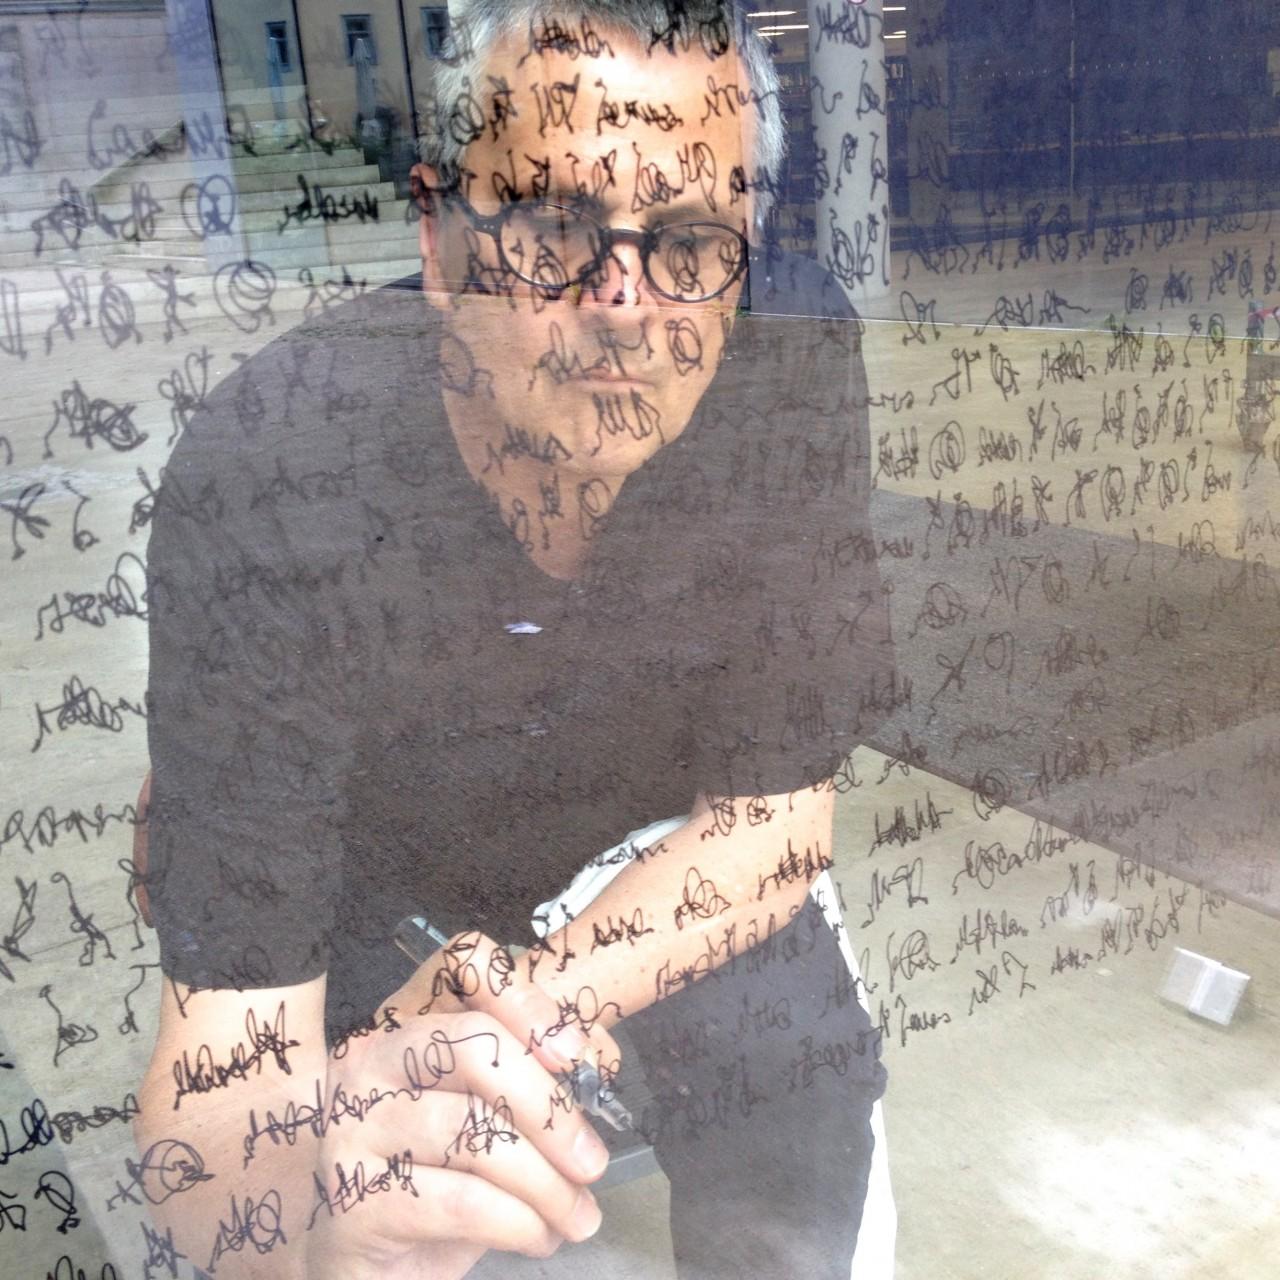 MALIK writing IMG_6492